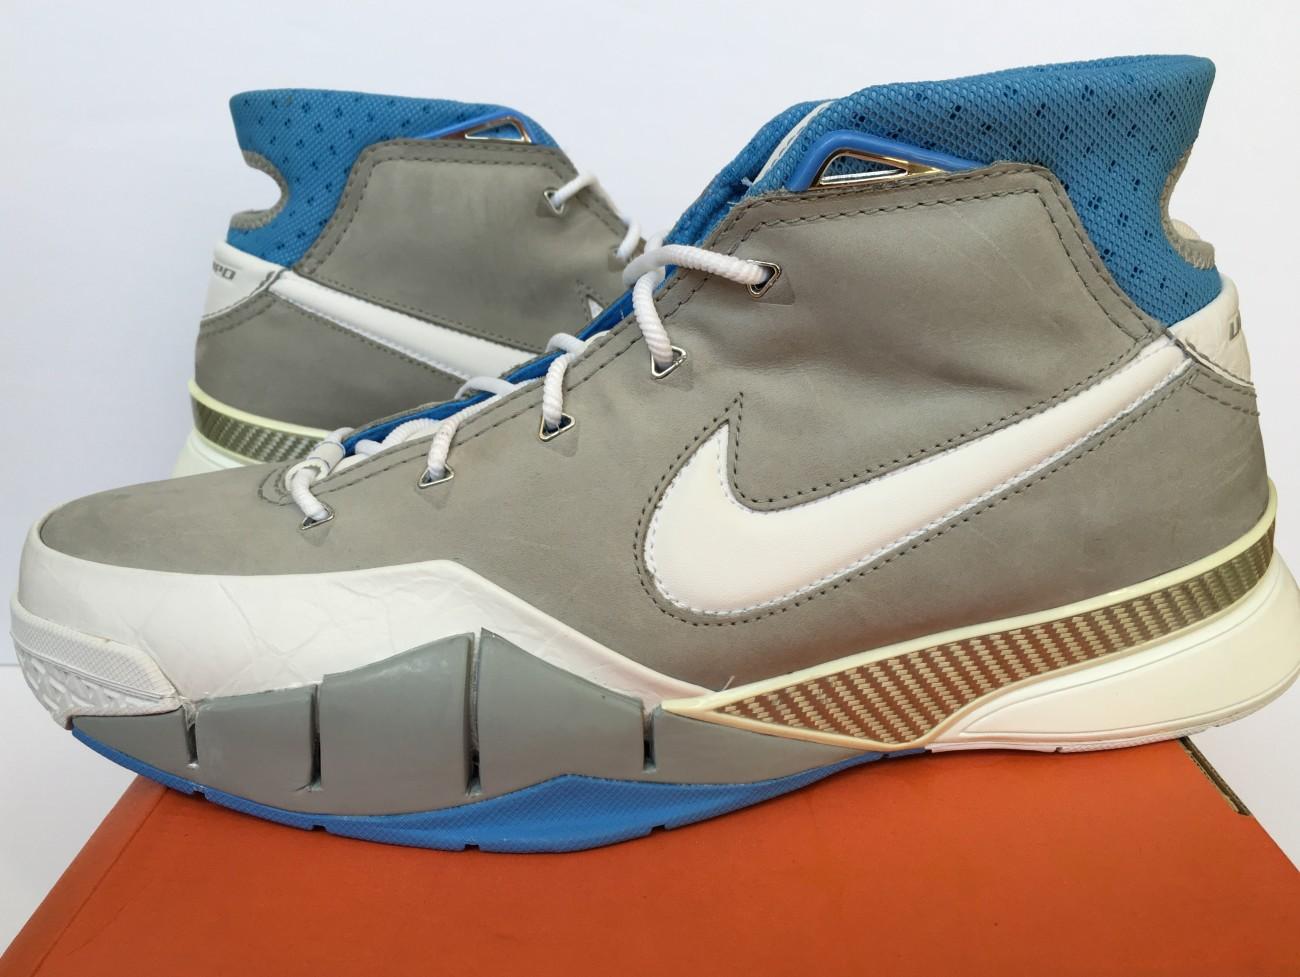 8dc9edce6fa9 OG Nike Zoom Kobe 1 Sneakers MPLS Minneapolis Lakers Size 12